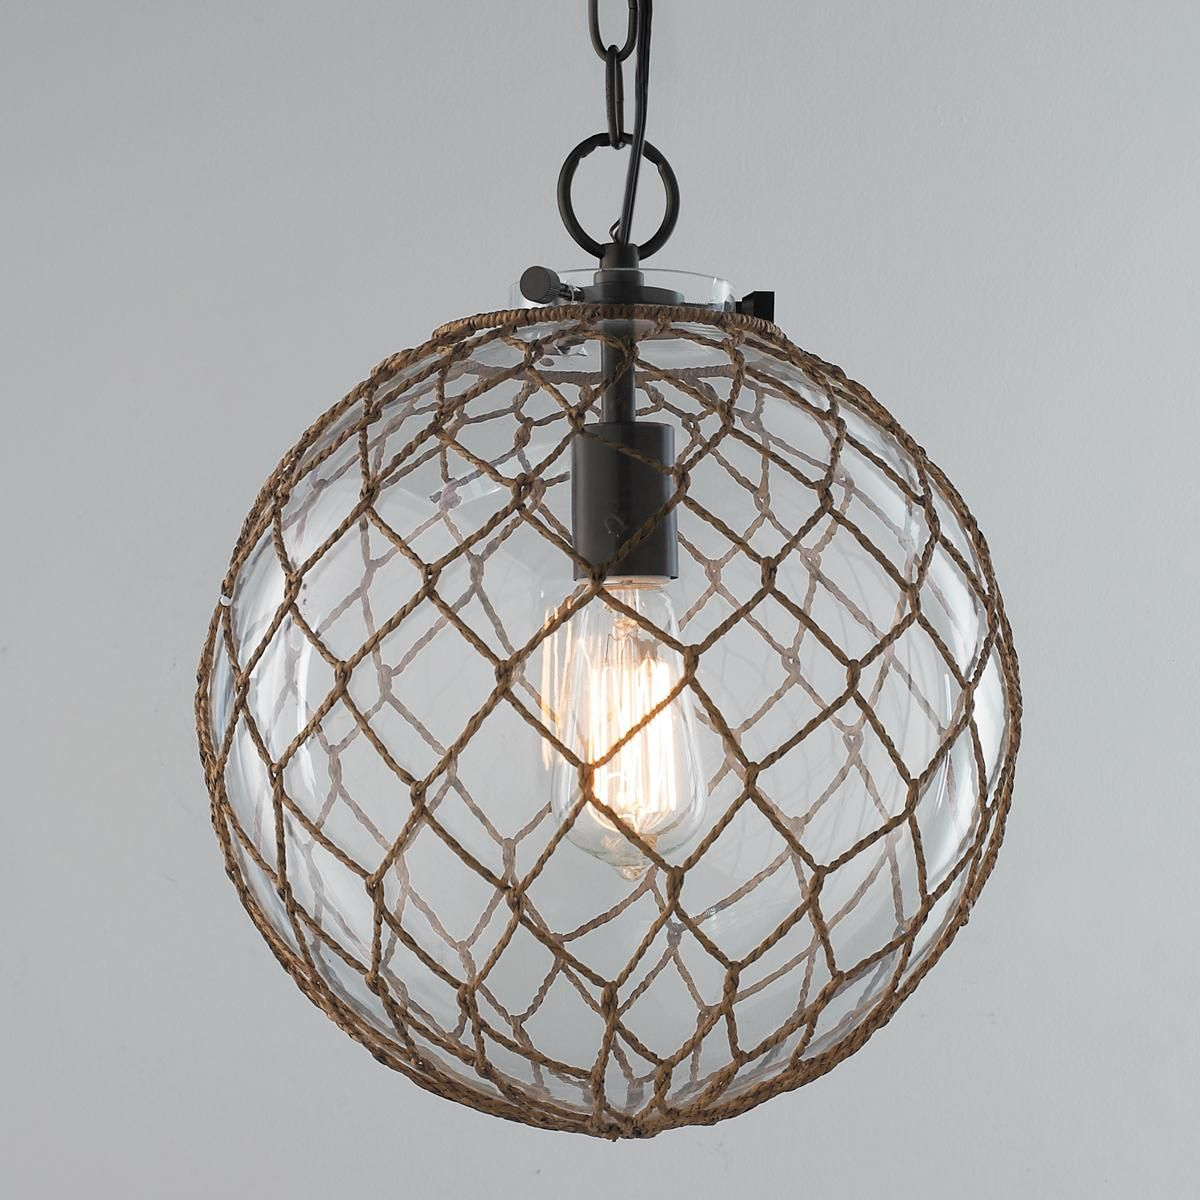 Nautical Decor Pendant Lighting: Nautical Rope Pendant Globe This Rope Wrapped Bubble Glass